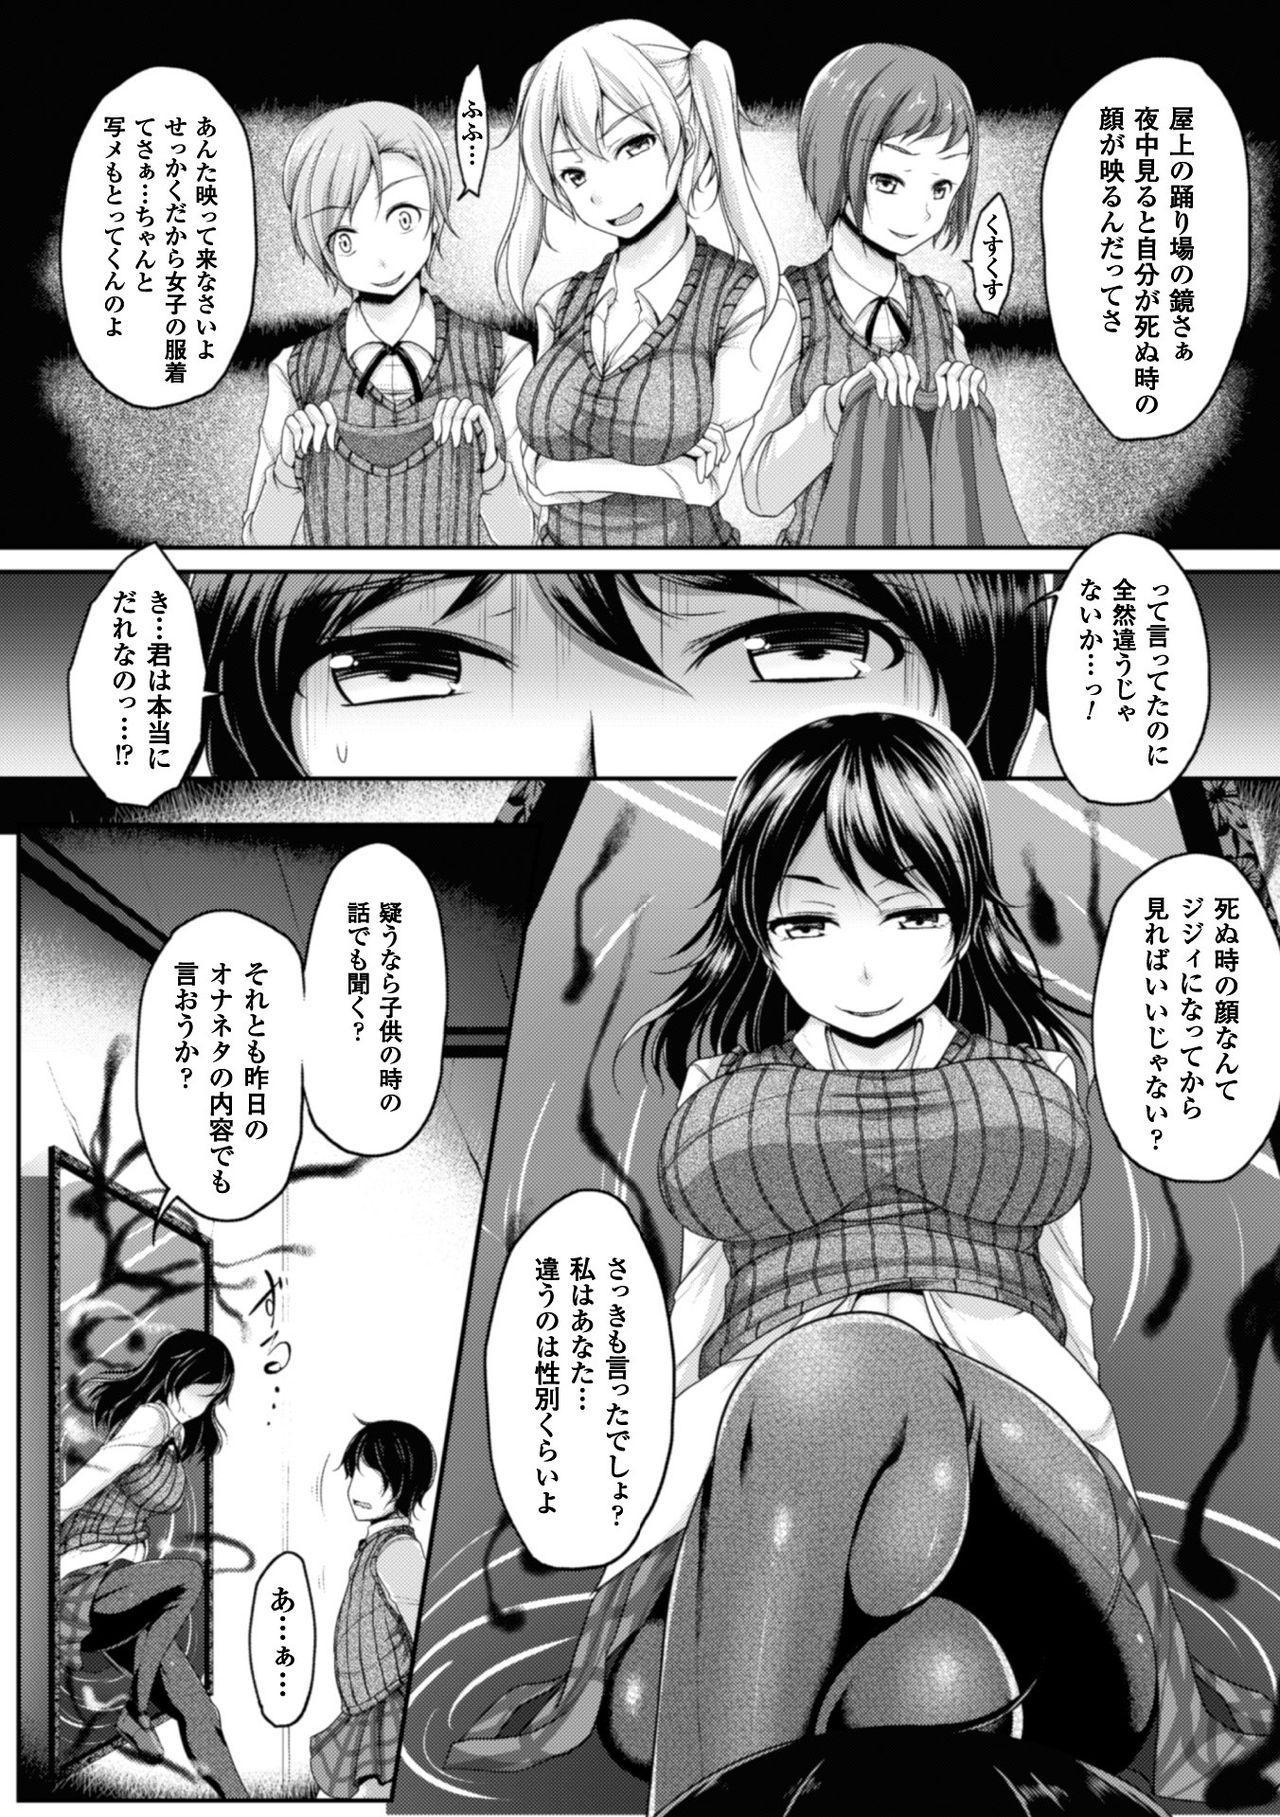 2D Comic Magazine TS Jibun Heroine mou Hitori no Ore ga Erosugite Gaman Dekinee! Vol. 1 43